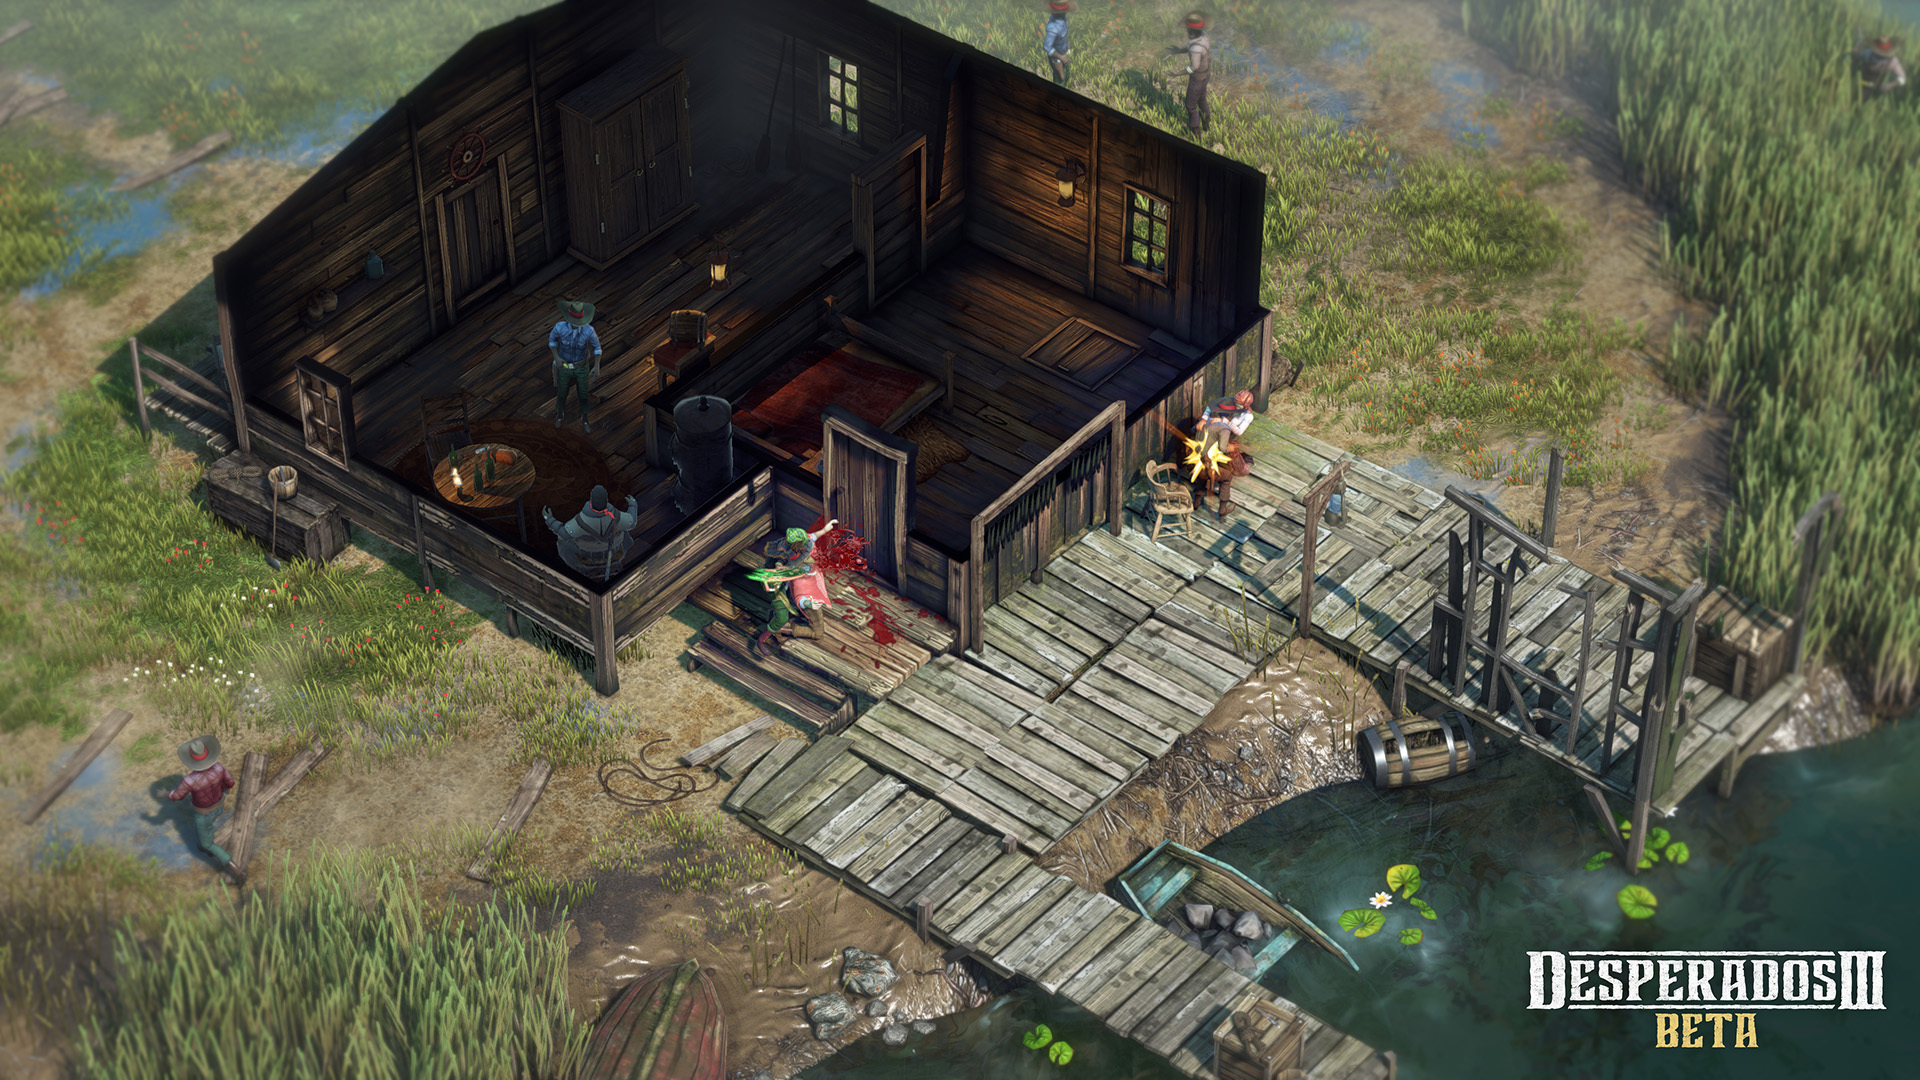 Desperados III Digital Deluxe Edition screenshot 3